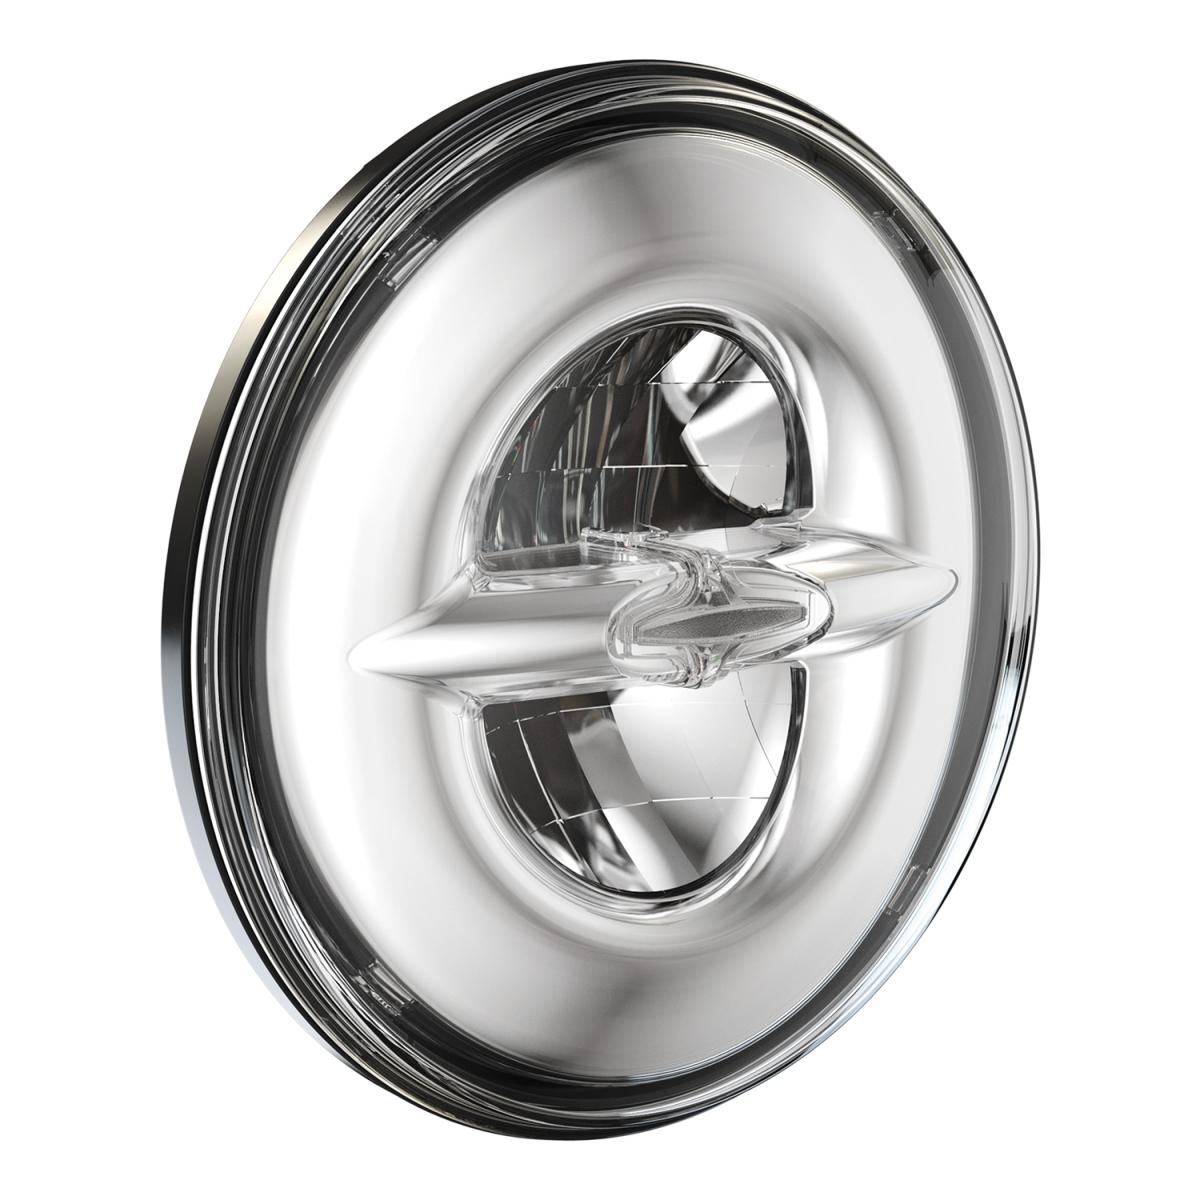 Reflector LED Headlights – Model 8720